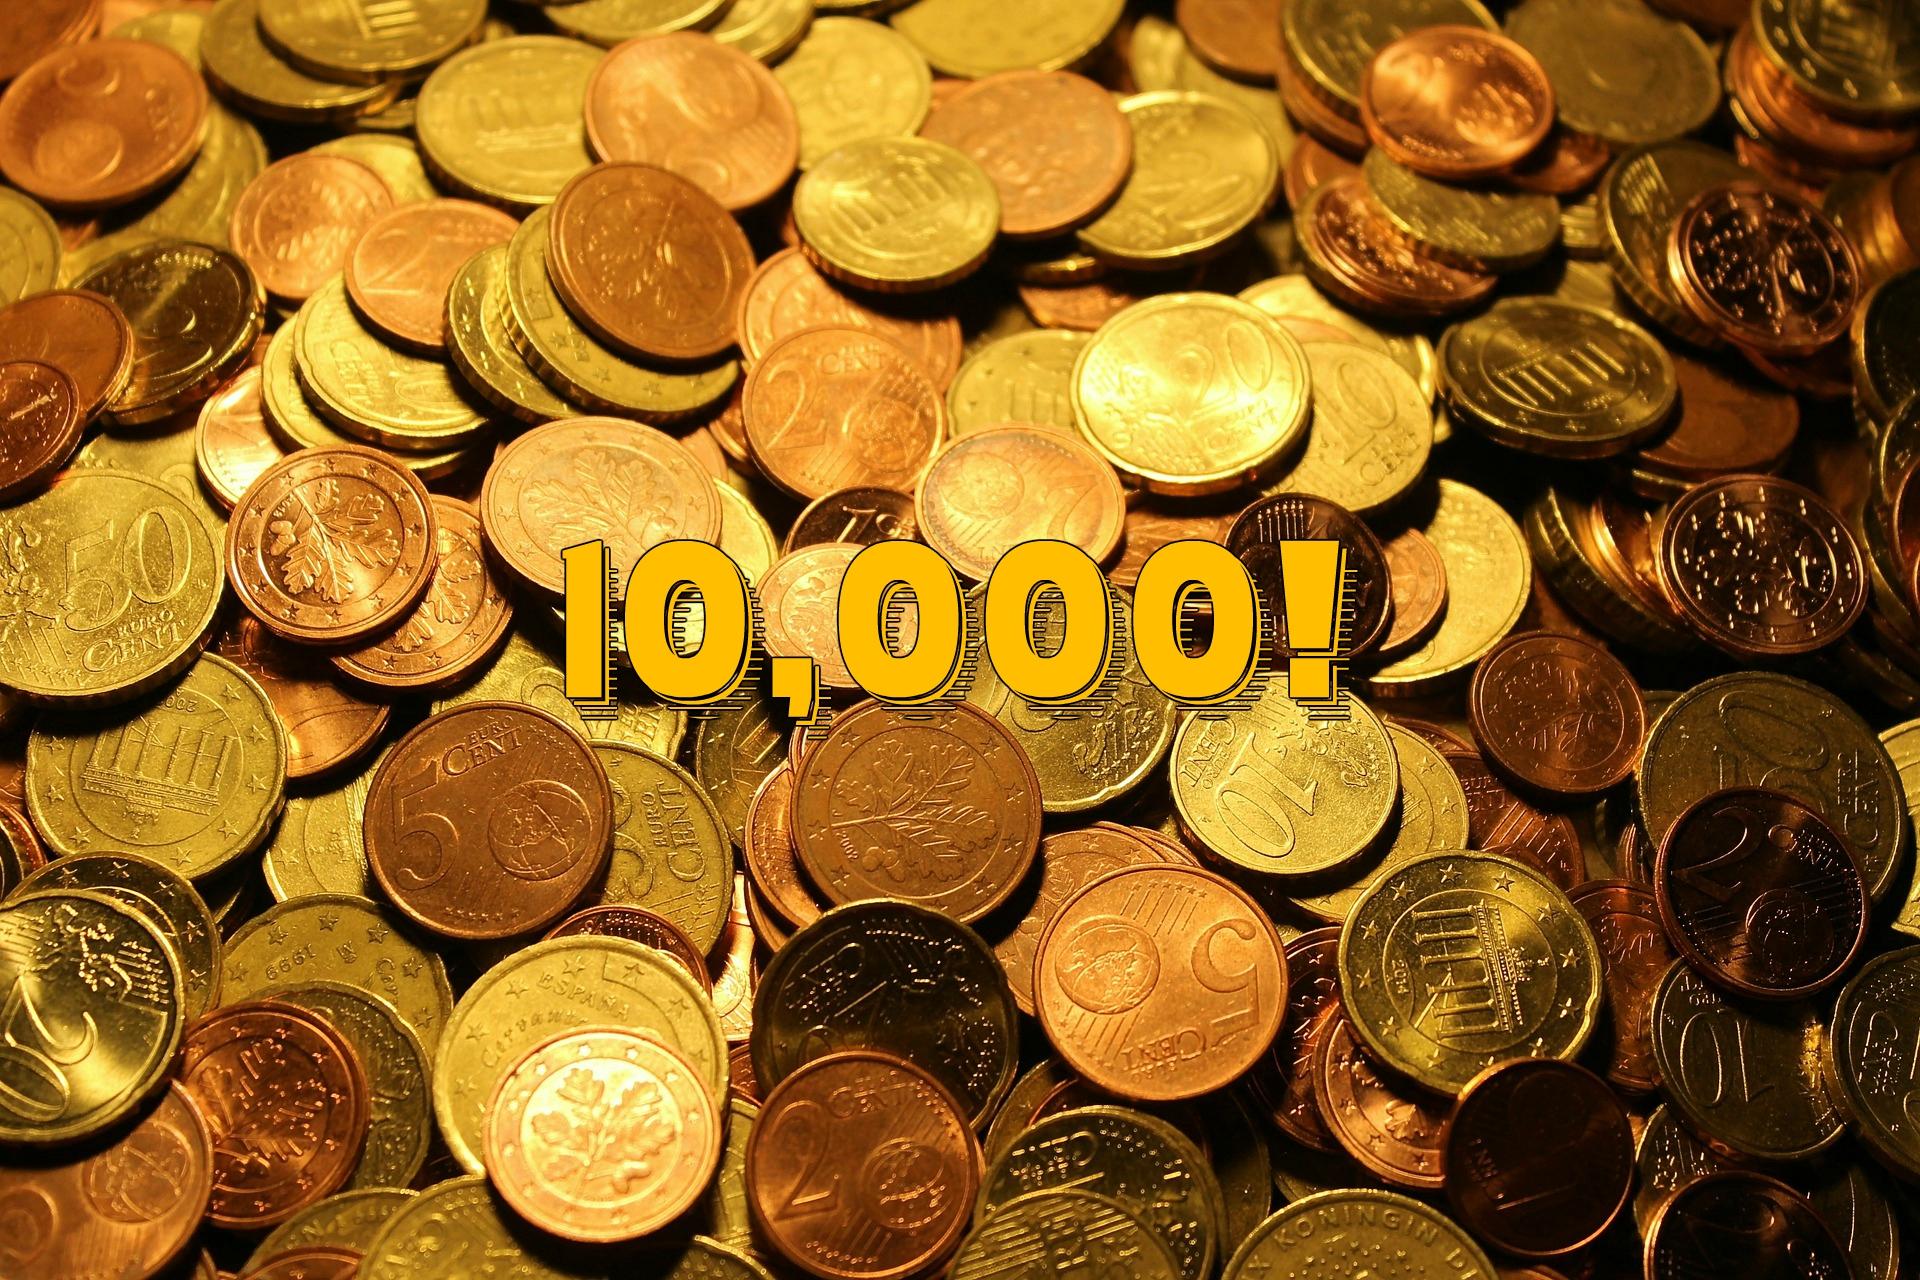 10,000 FM Coins